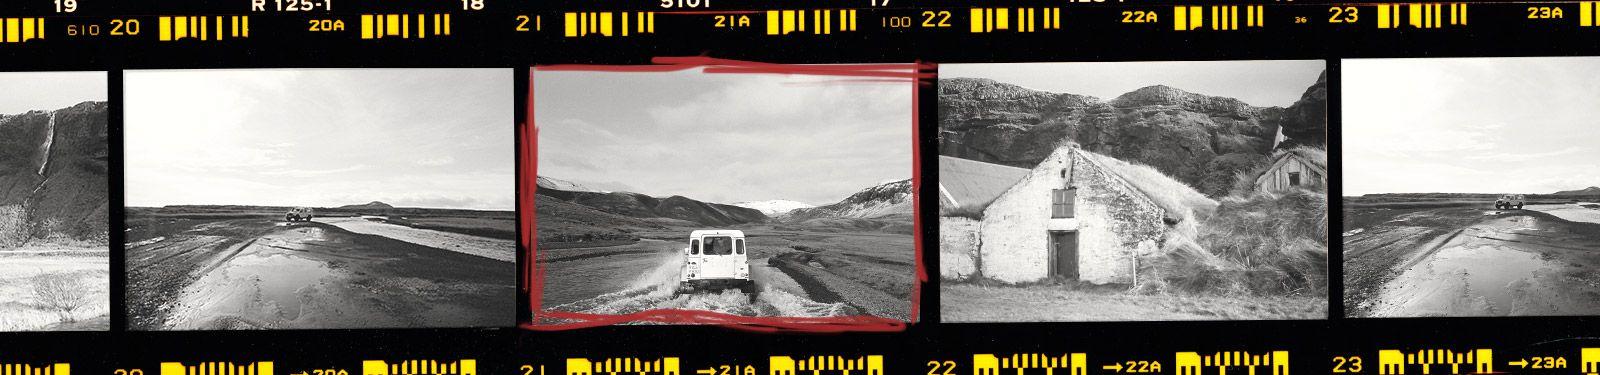 Develop-Film-Ambiance-Gear-Patrol